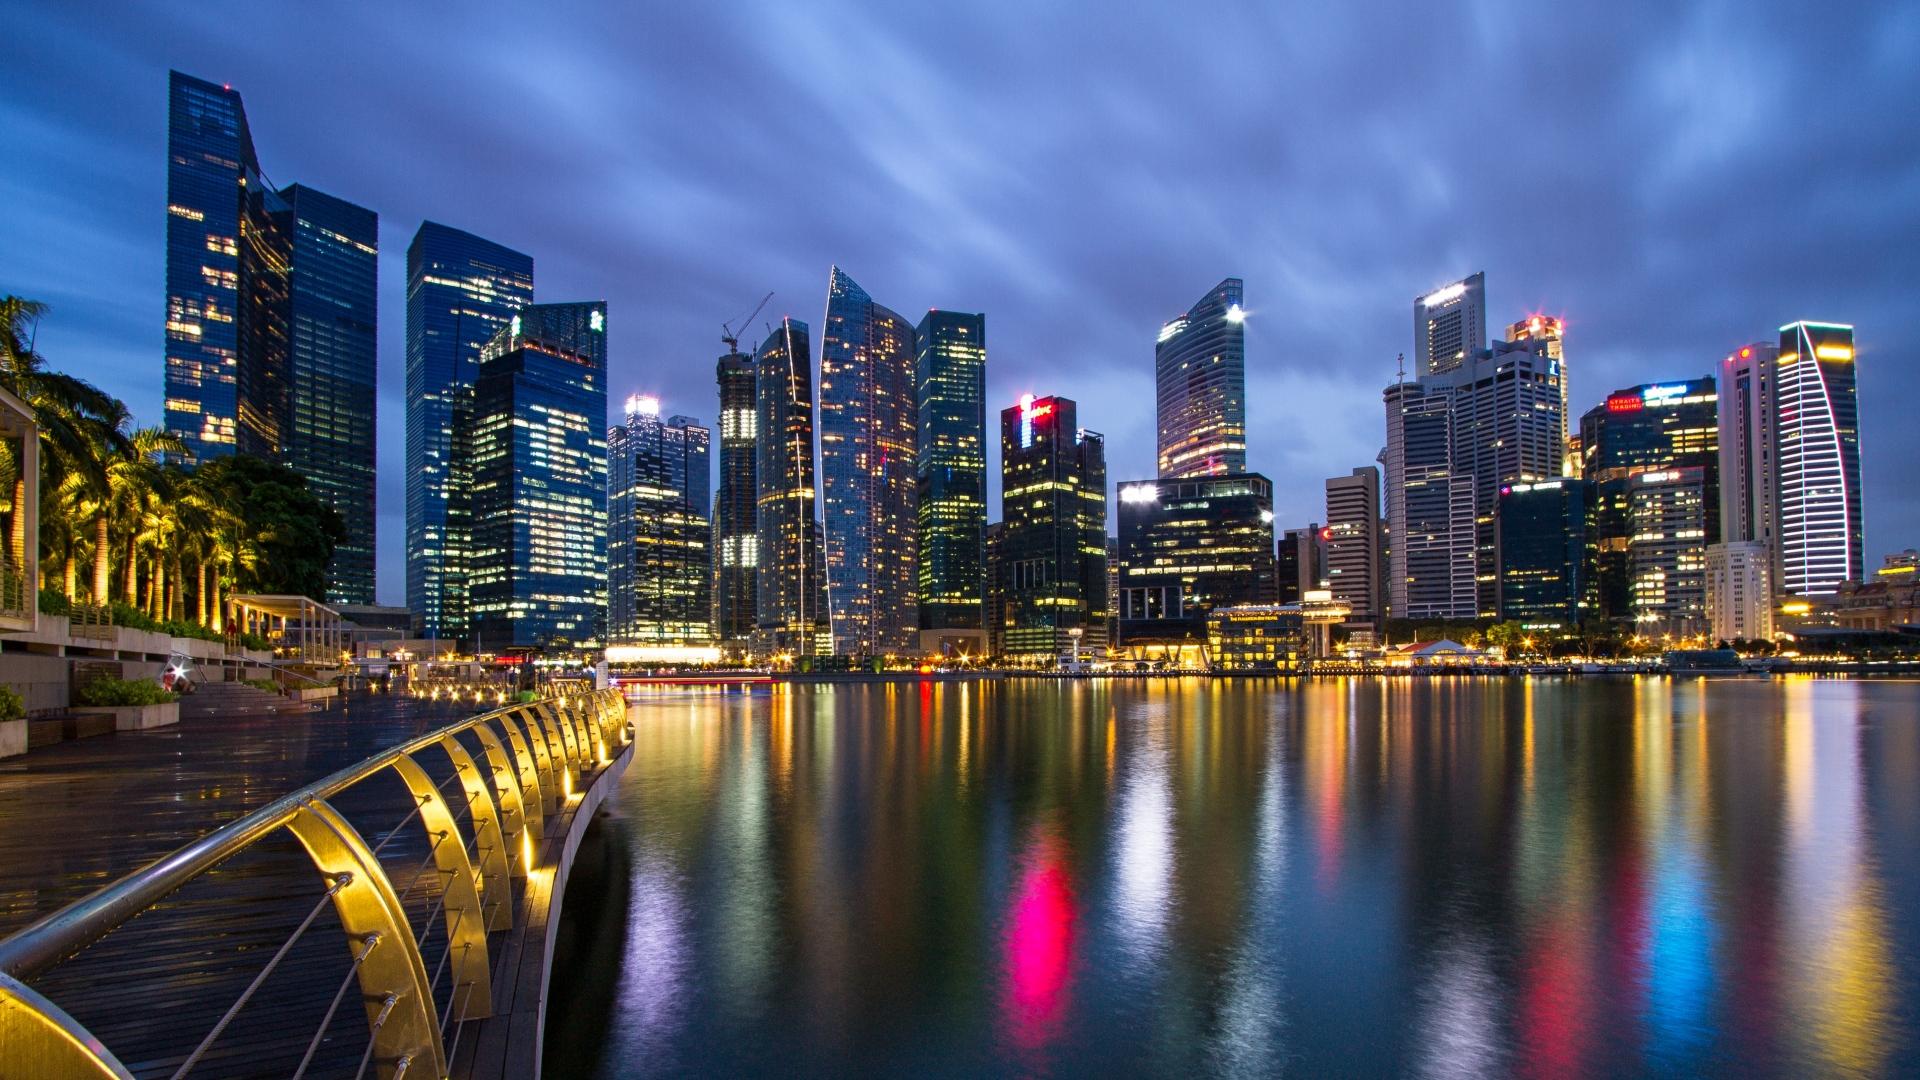 Malaysia Singapore City State Metropolis Skyscrapers Night Lights Light Blue Sky Bridge Embankment Spilling 58644 1920x1080